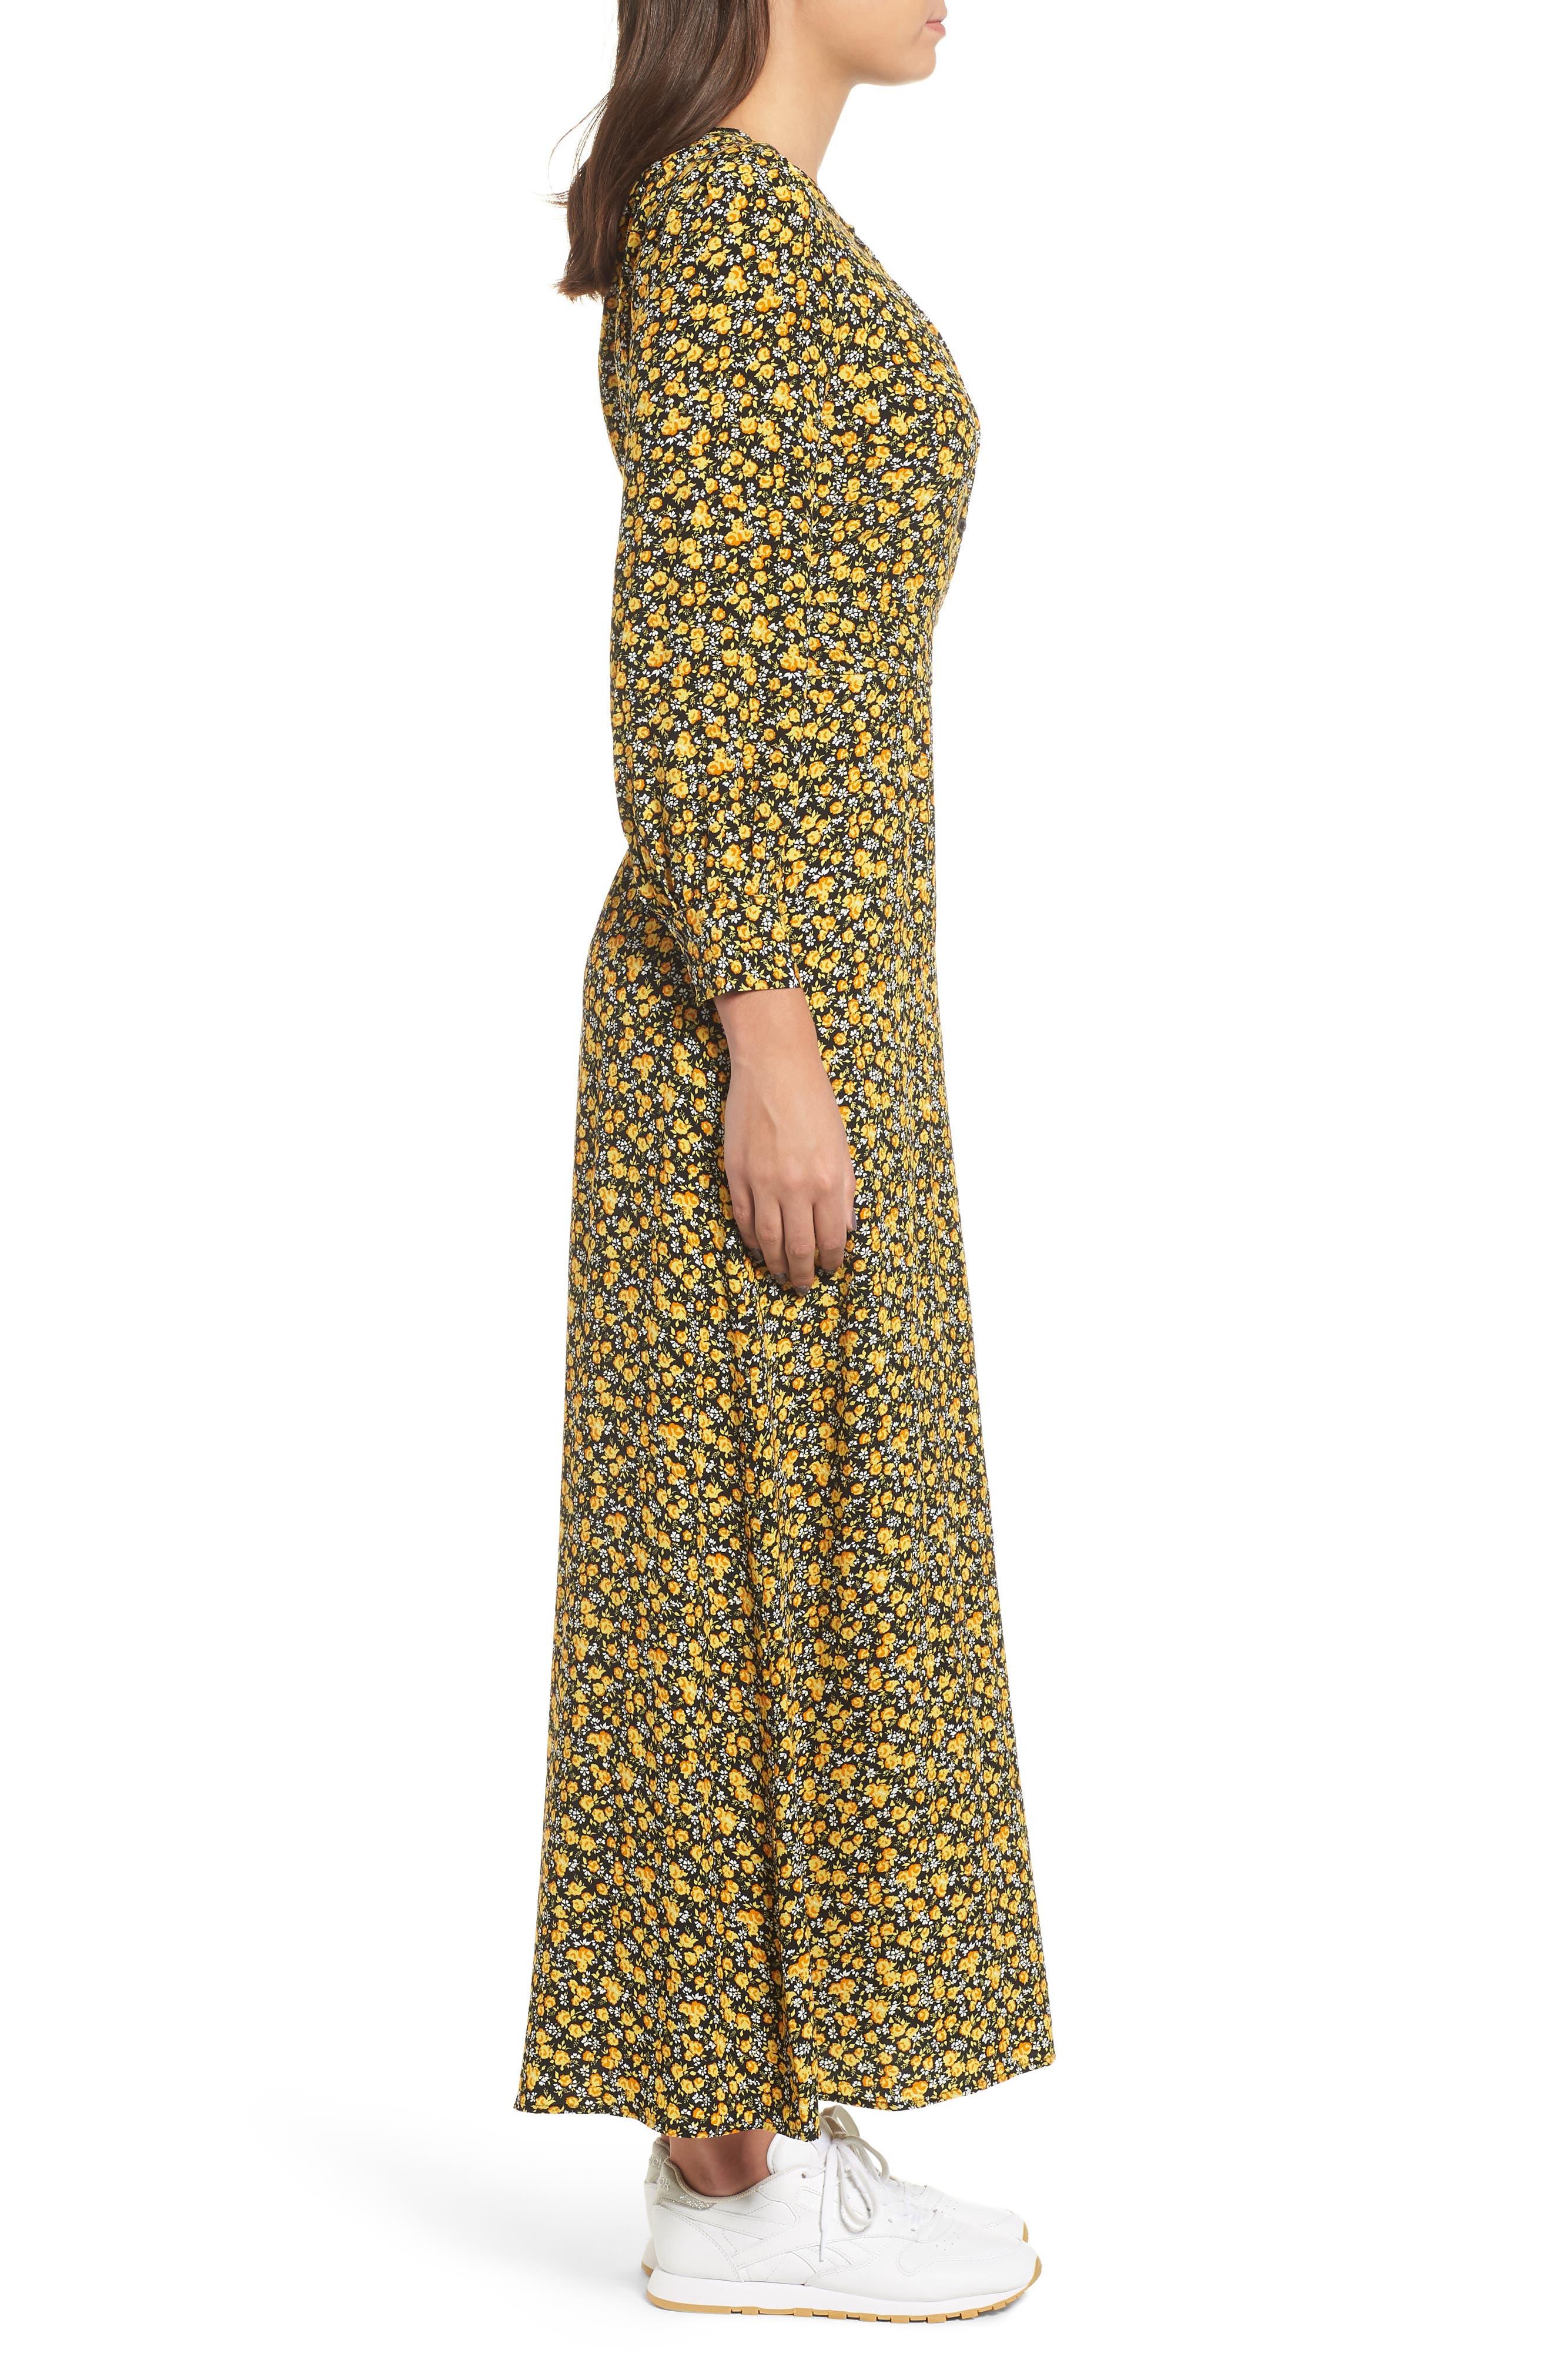 Ditzy Floral Dress,                             Alternate thumbnail 3, color,                             DITSY FLOWER